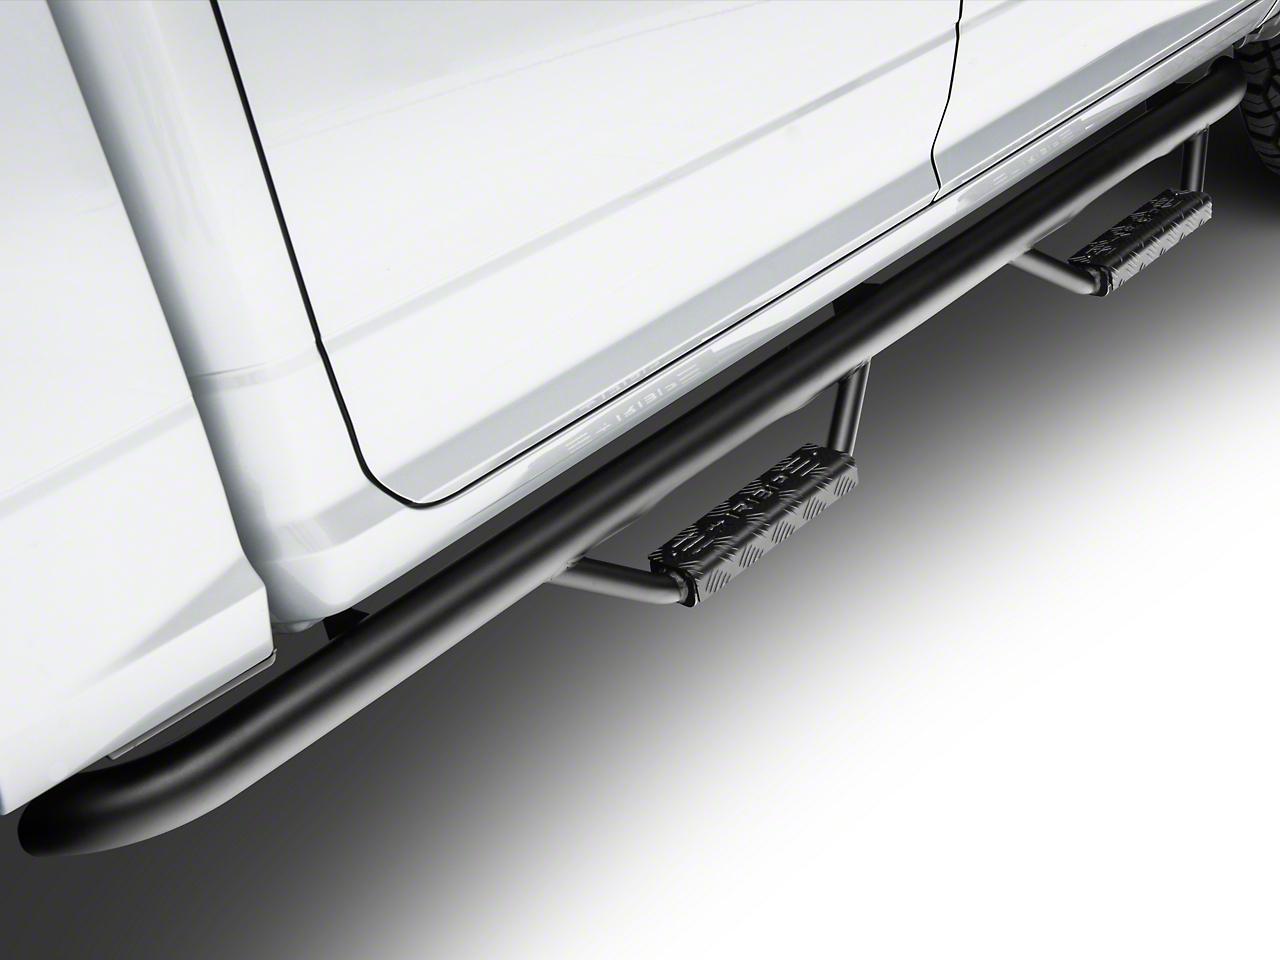 RBP RX-7 Side Step Bars - Black (09-18 RAM 1500 Quad Cab, Crew Cab)